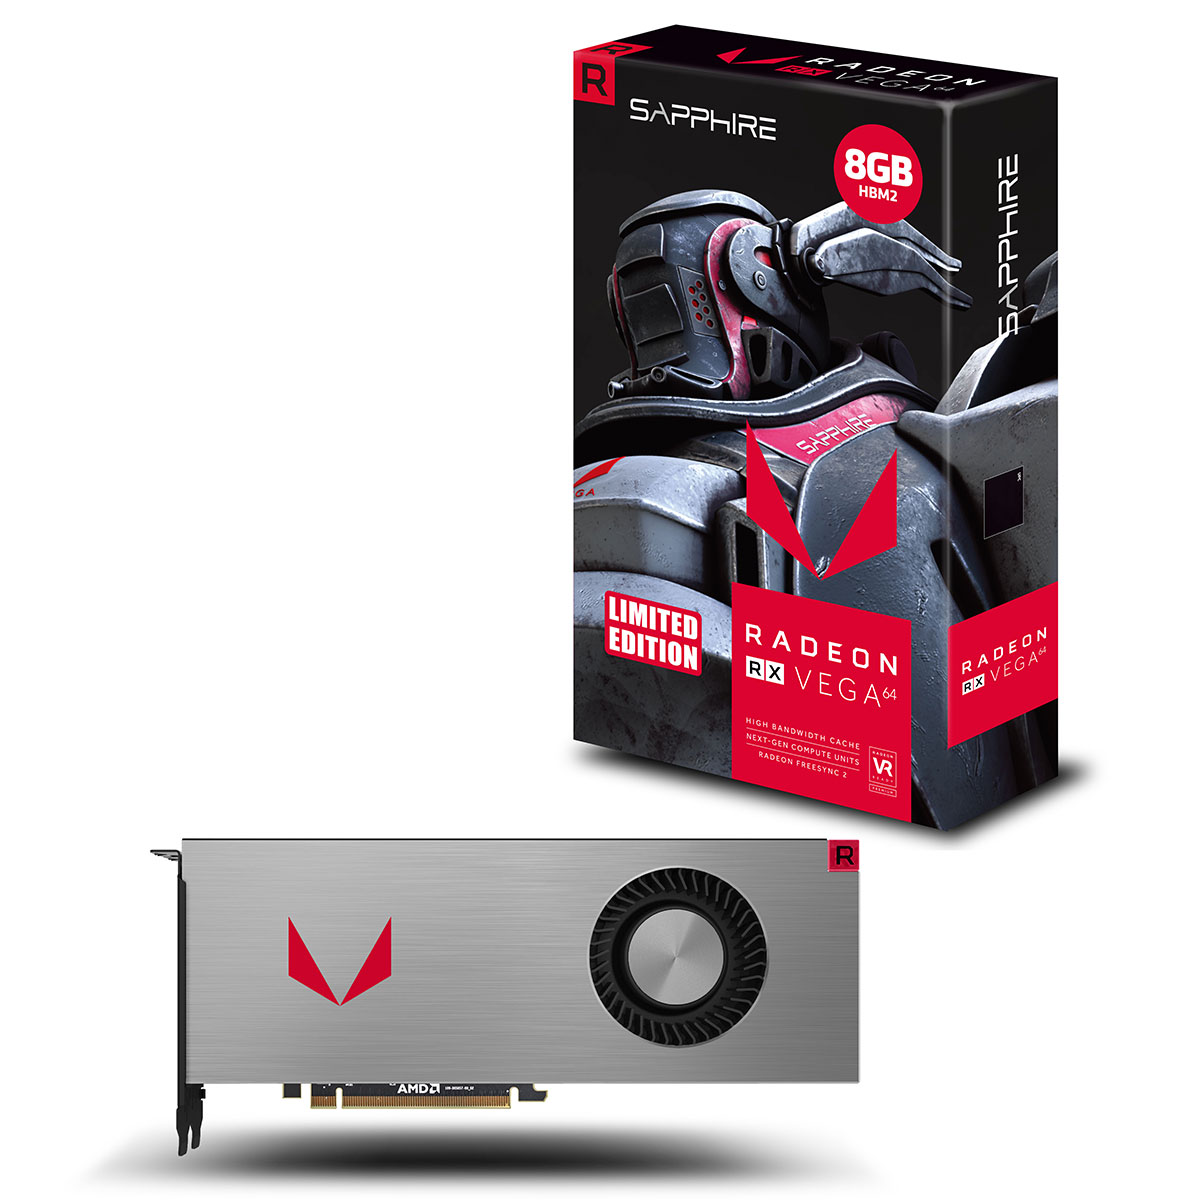 Carte graphique Sapphire Radeon RX Vega 64 8G HBM2 Limited Edition 8 Go HDMI/Tri DisplayPort - PCI Express (AMD Radeon RX Vega 64)